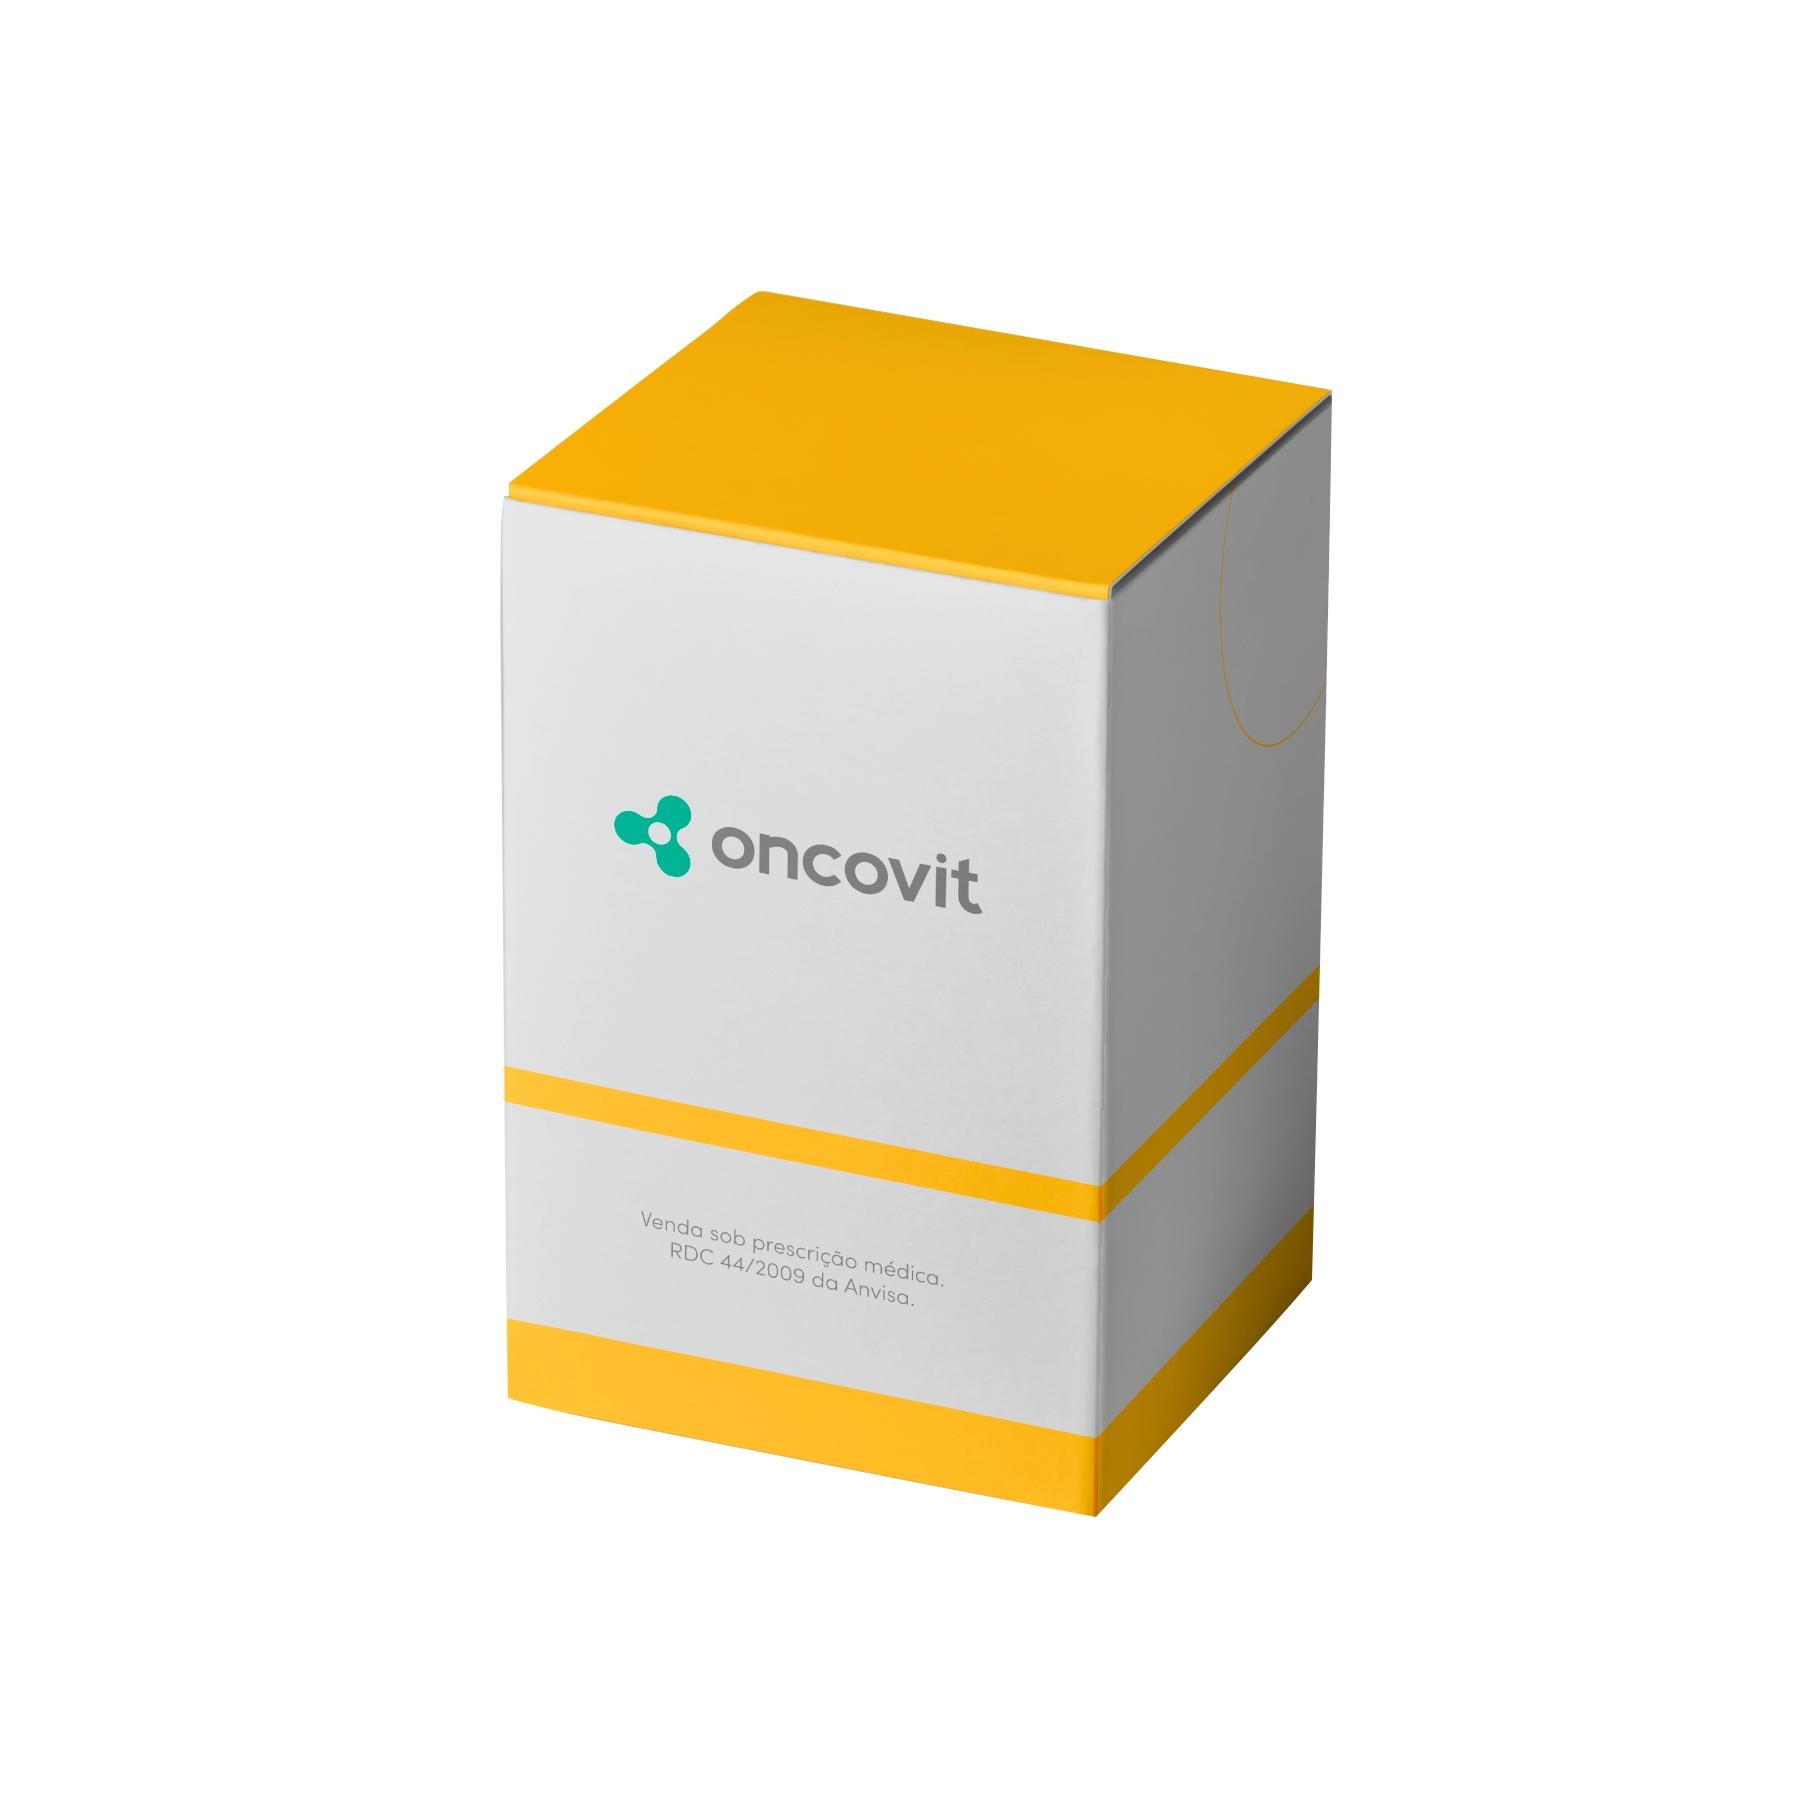 Citrato de Tamoxifeno 20mg caixa com 30 comprimidos revestidos